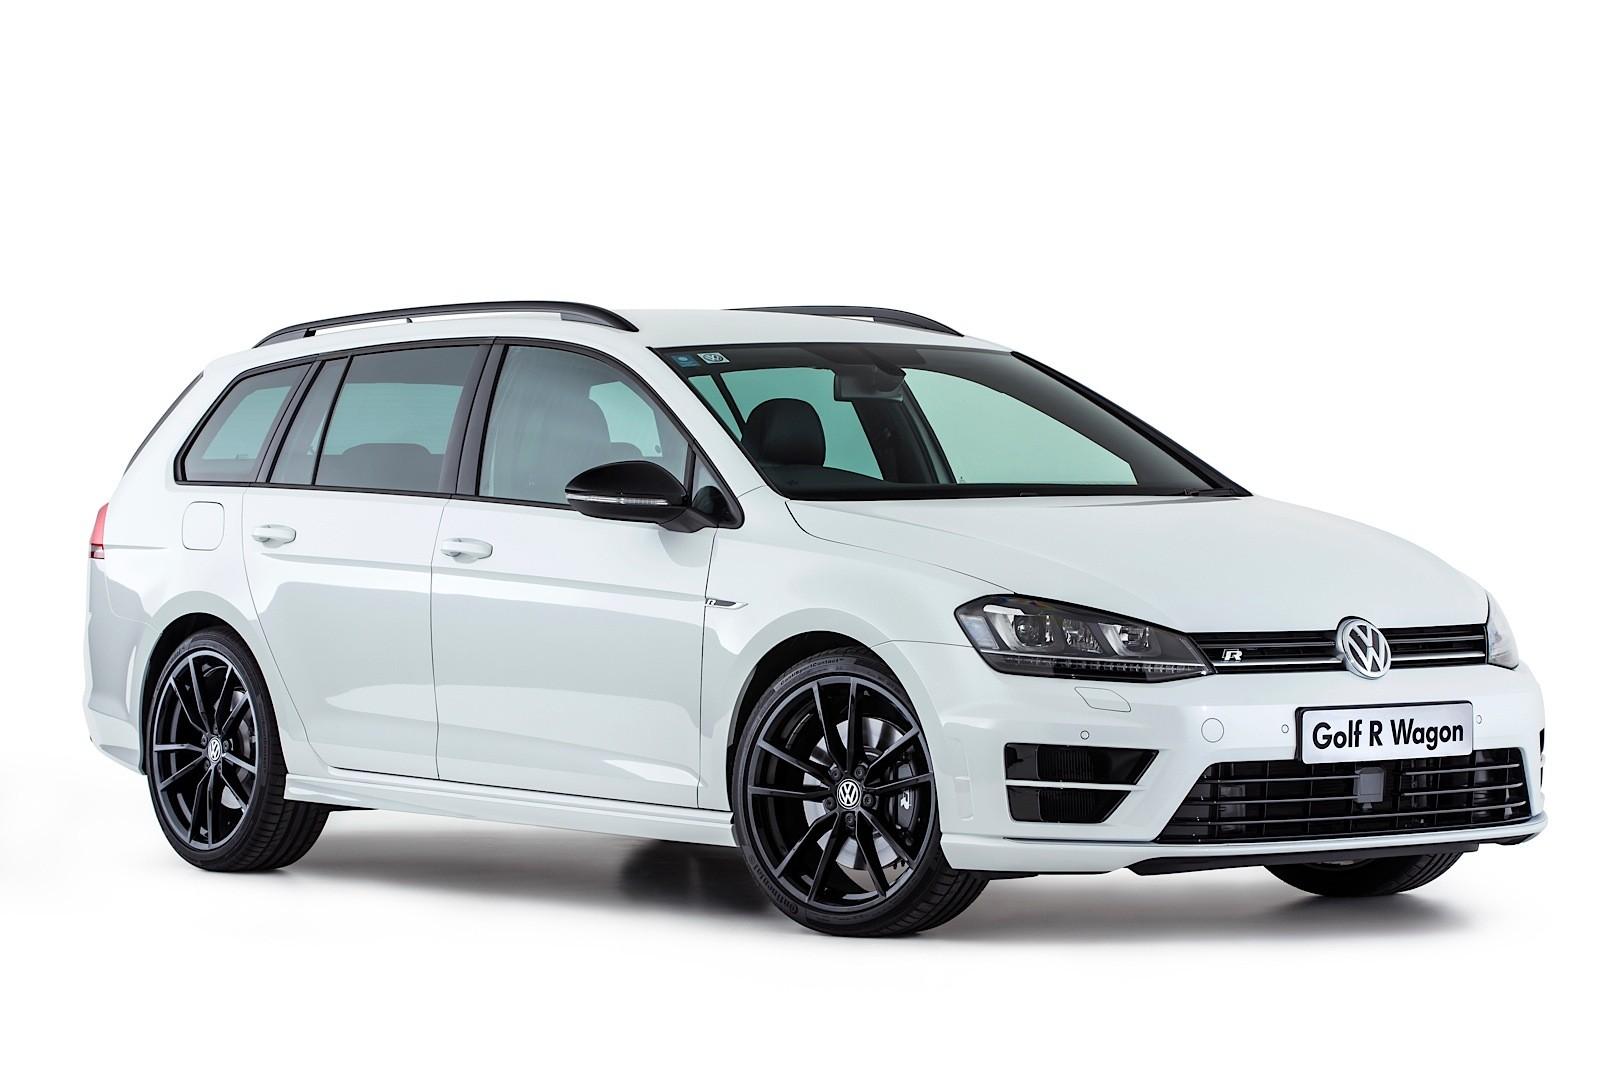 Volkswagen Launches Golf R Wagon Wolfsburg Edition in Australia and It's White - autoevolution